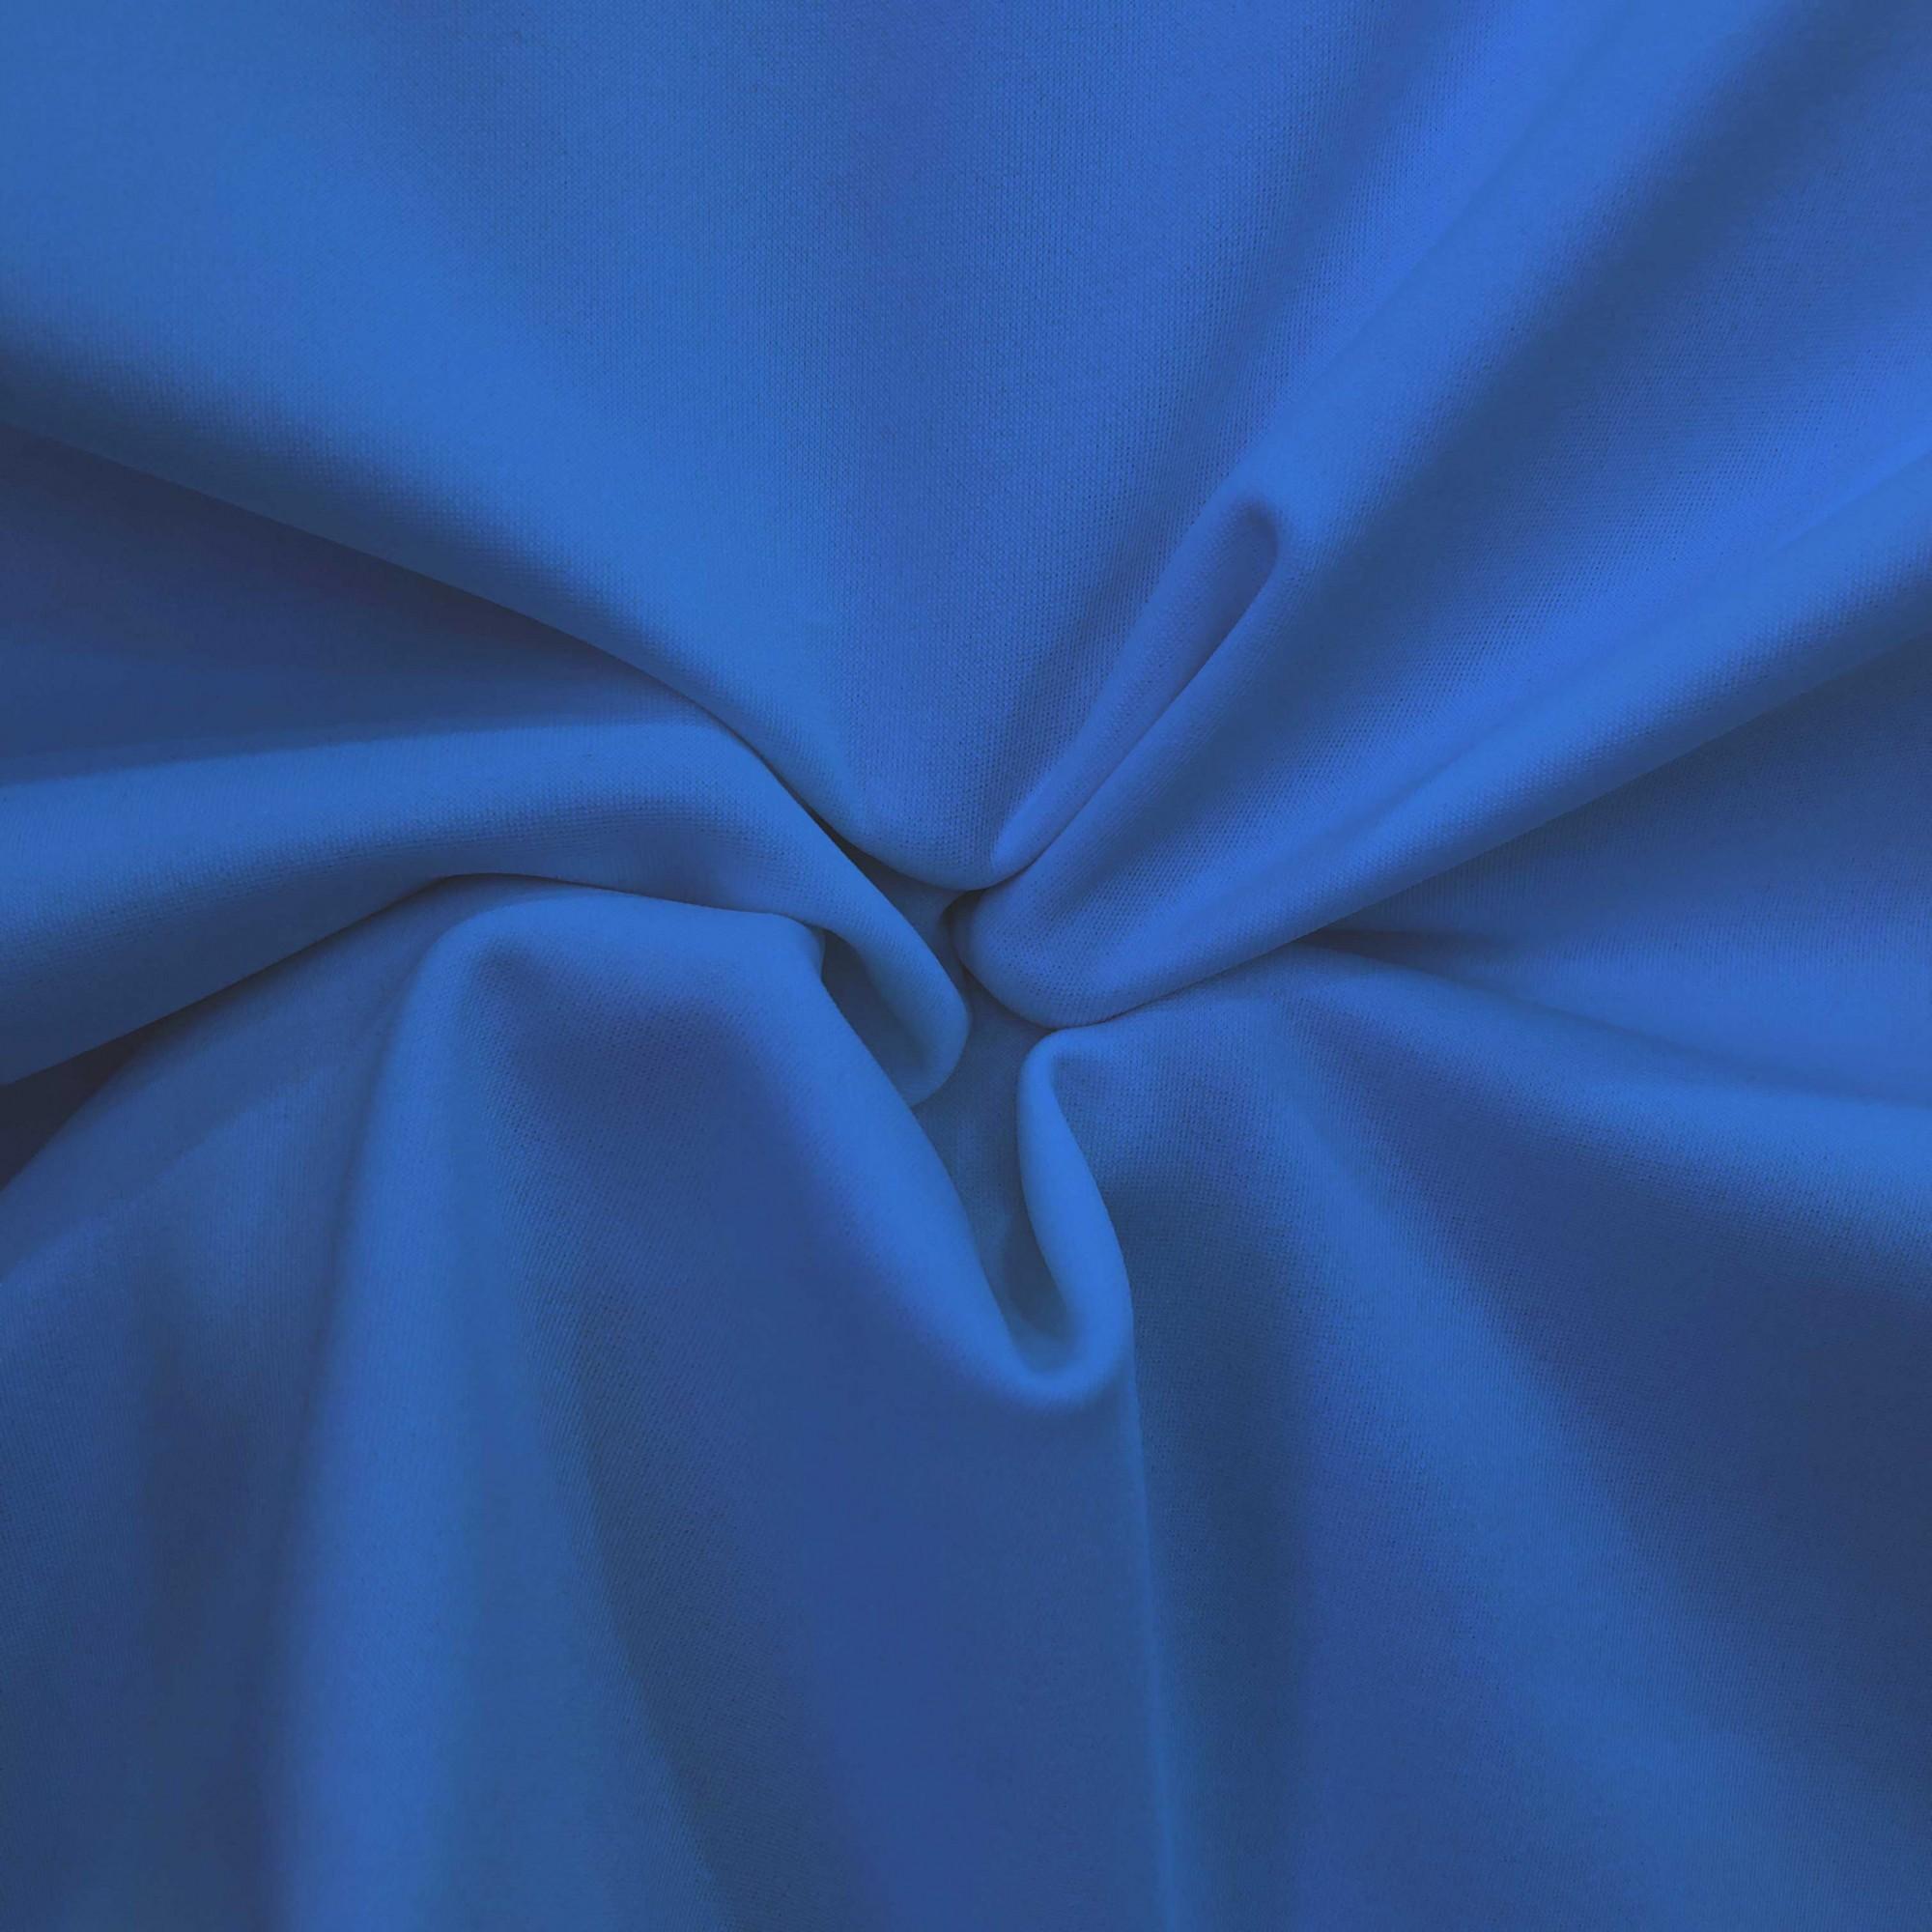 Tecido Malha Neocrepe Liso 97%Poliéster 3%Elastano Azul Royal